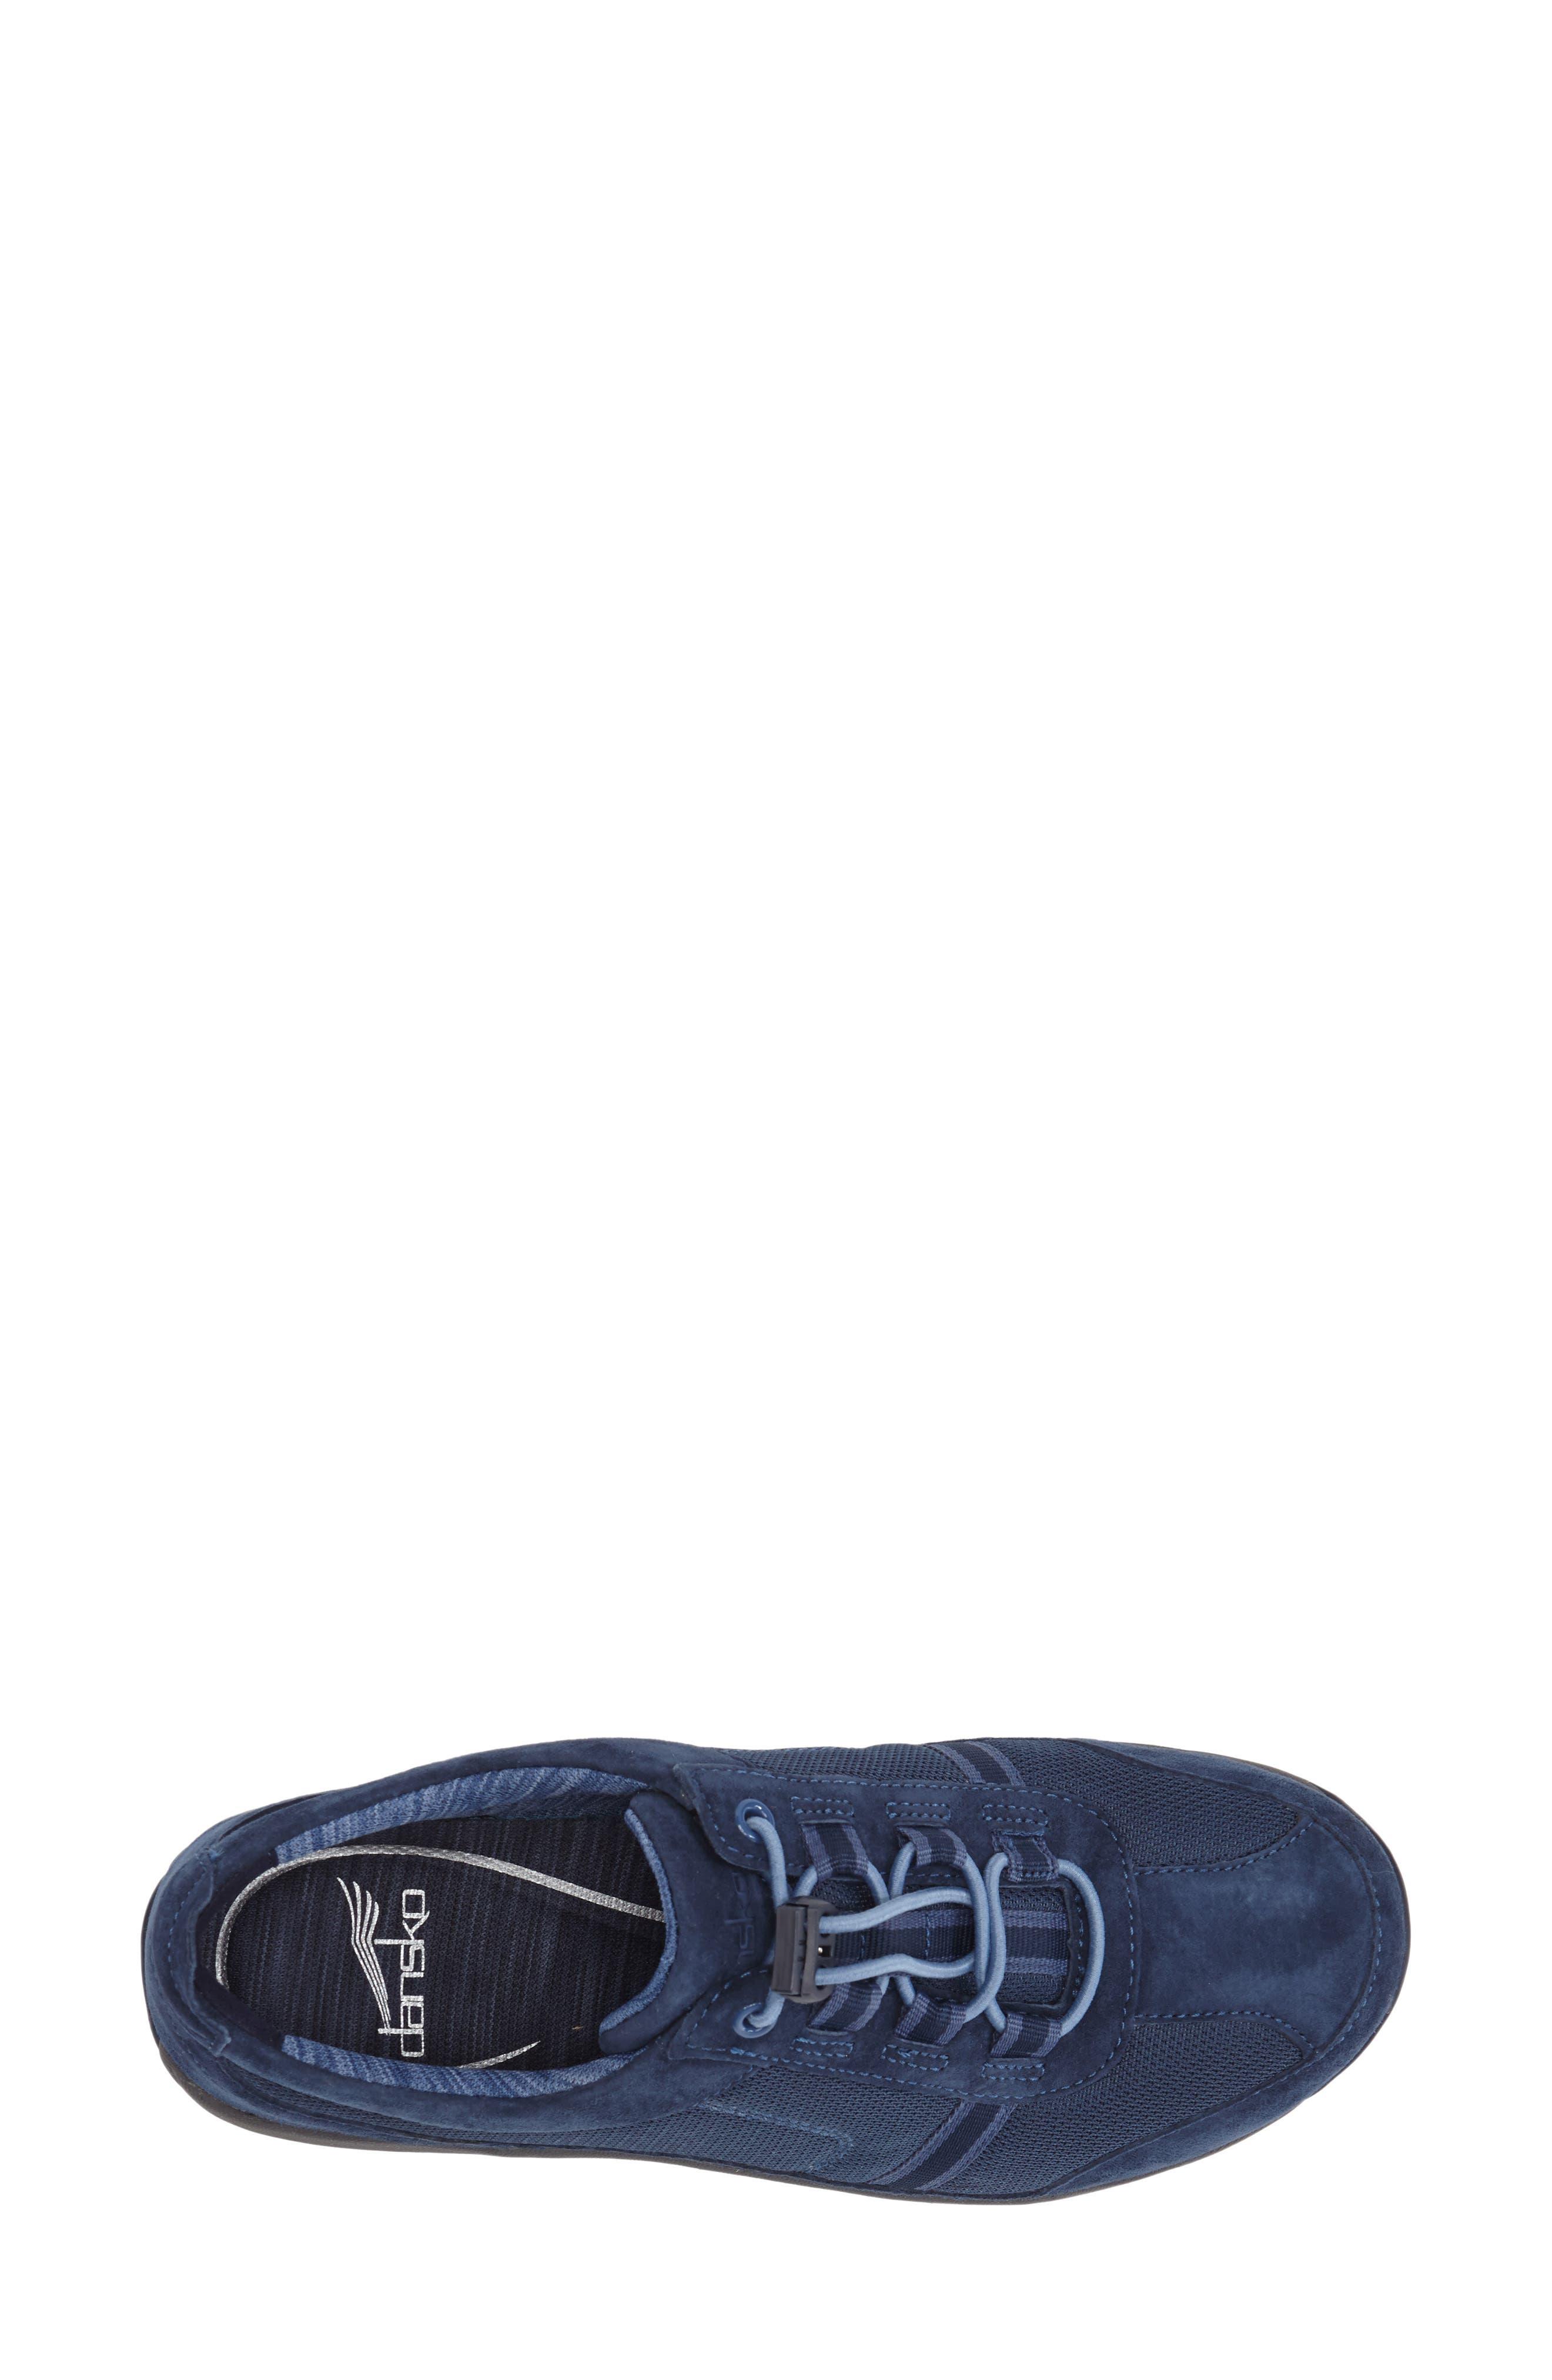 'Helen' Suede & Mesh Sneaker,                             Alternate thumbnail 57, color,